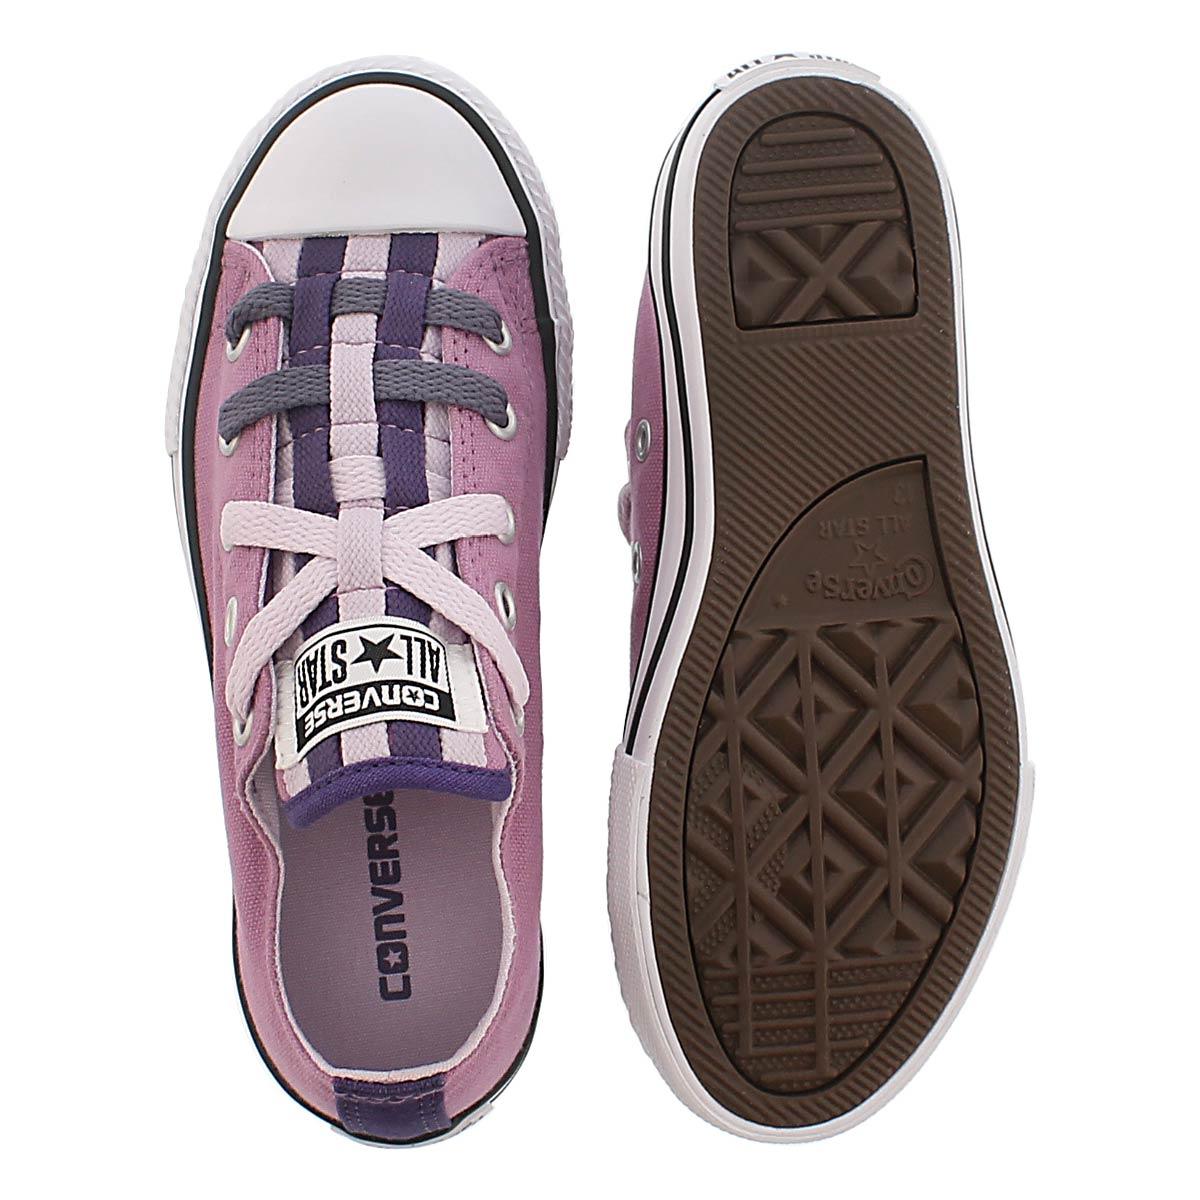 Grs CTAS Loopholes Canvas purple sneaker